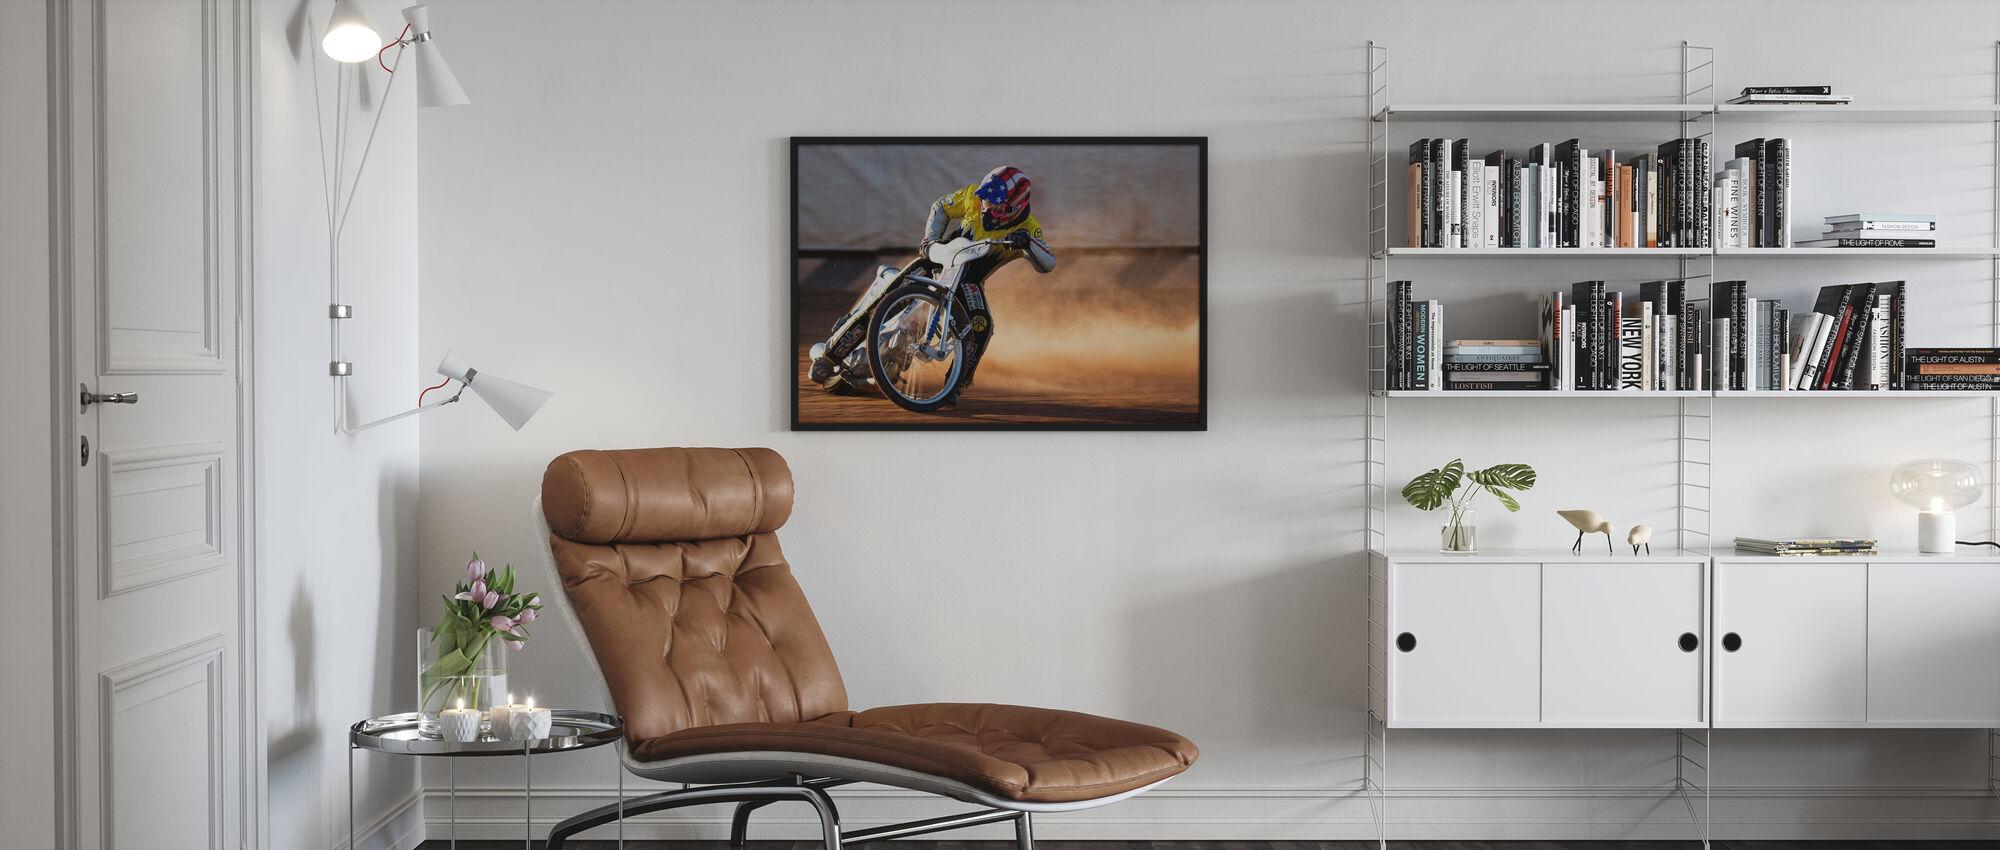 Going Sideways - Poster - Living Room